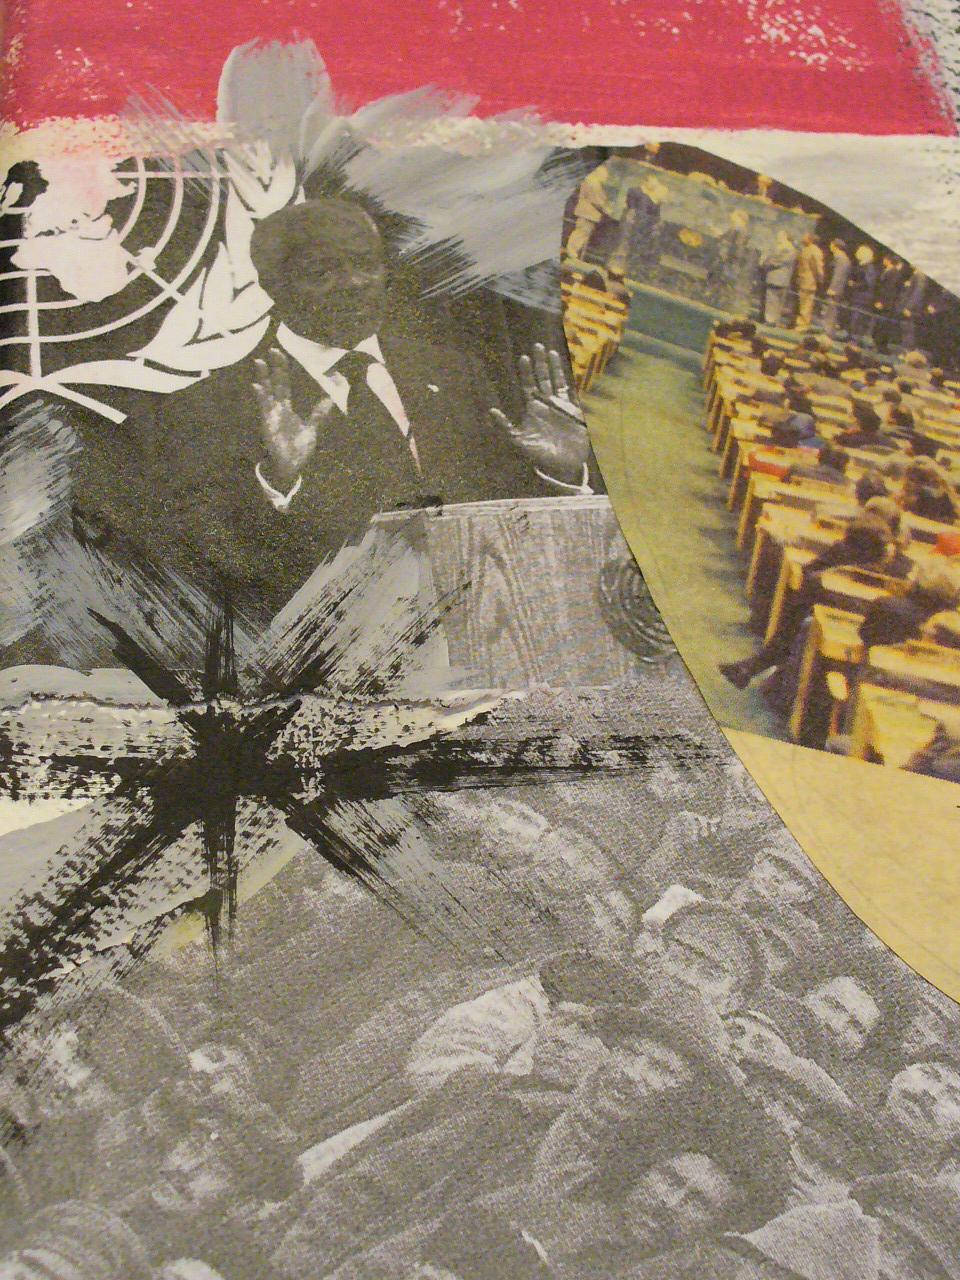 TELLusVISION peace collages KARIANNE B ARTISTE CONTEMPORAIN CONTEMPORARY ARTIST marginal outsiderart paix amazing nobel peace price NOBELS FREDSPRIS